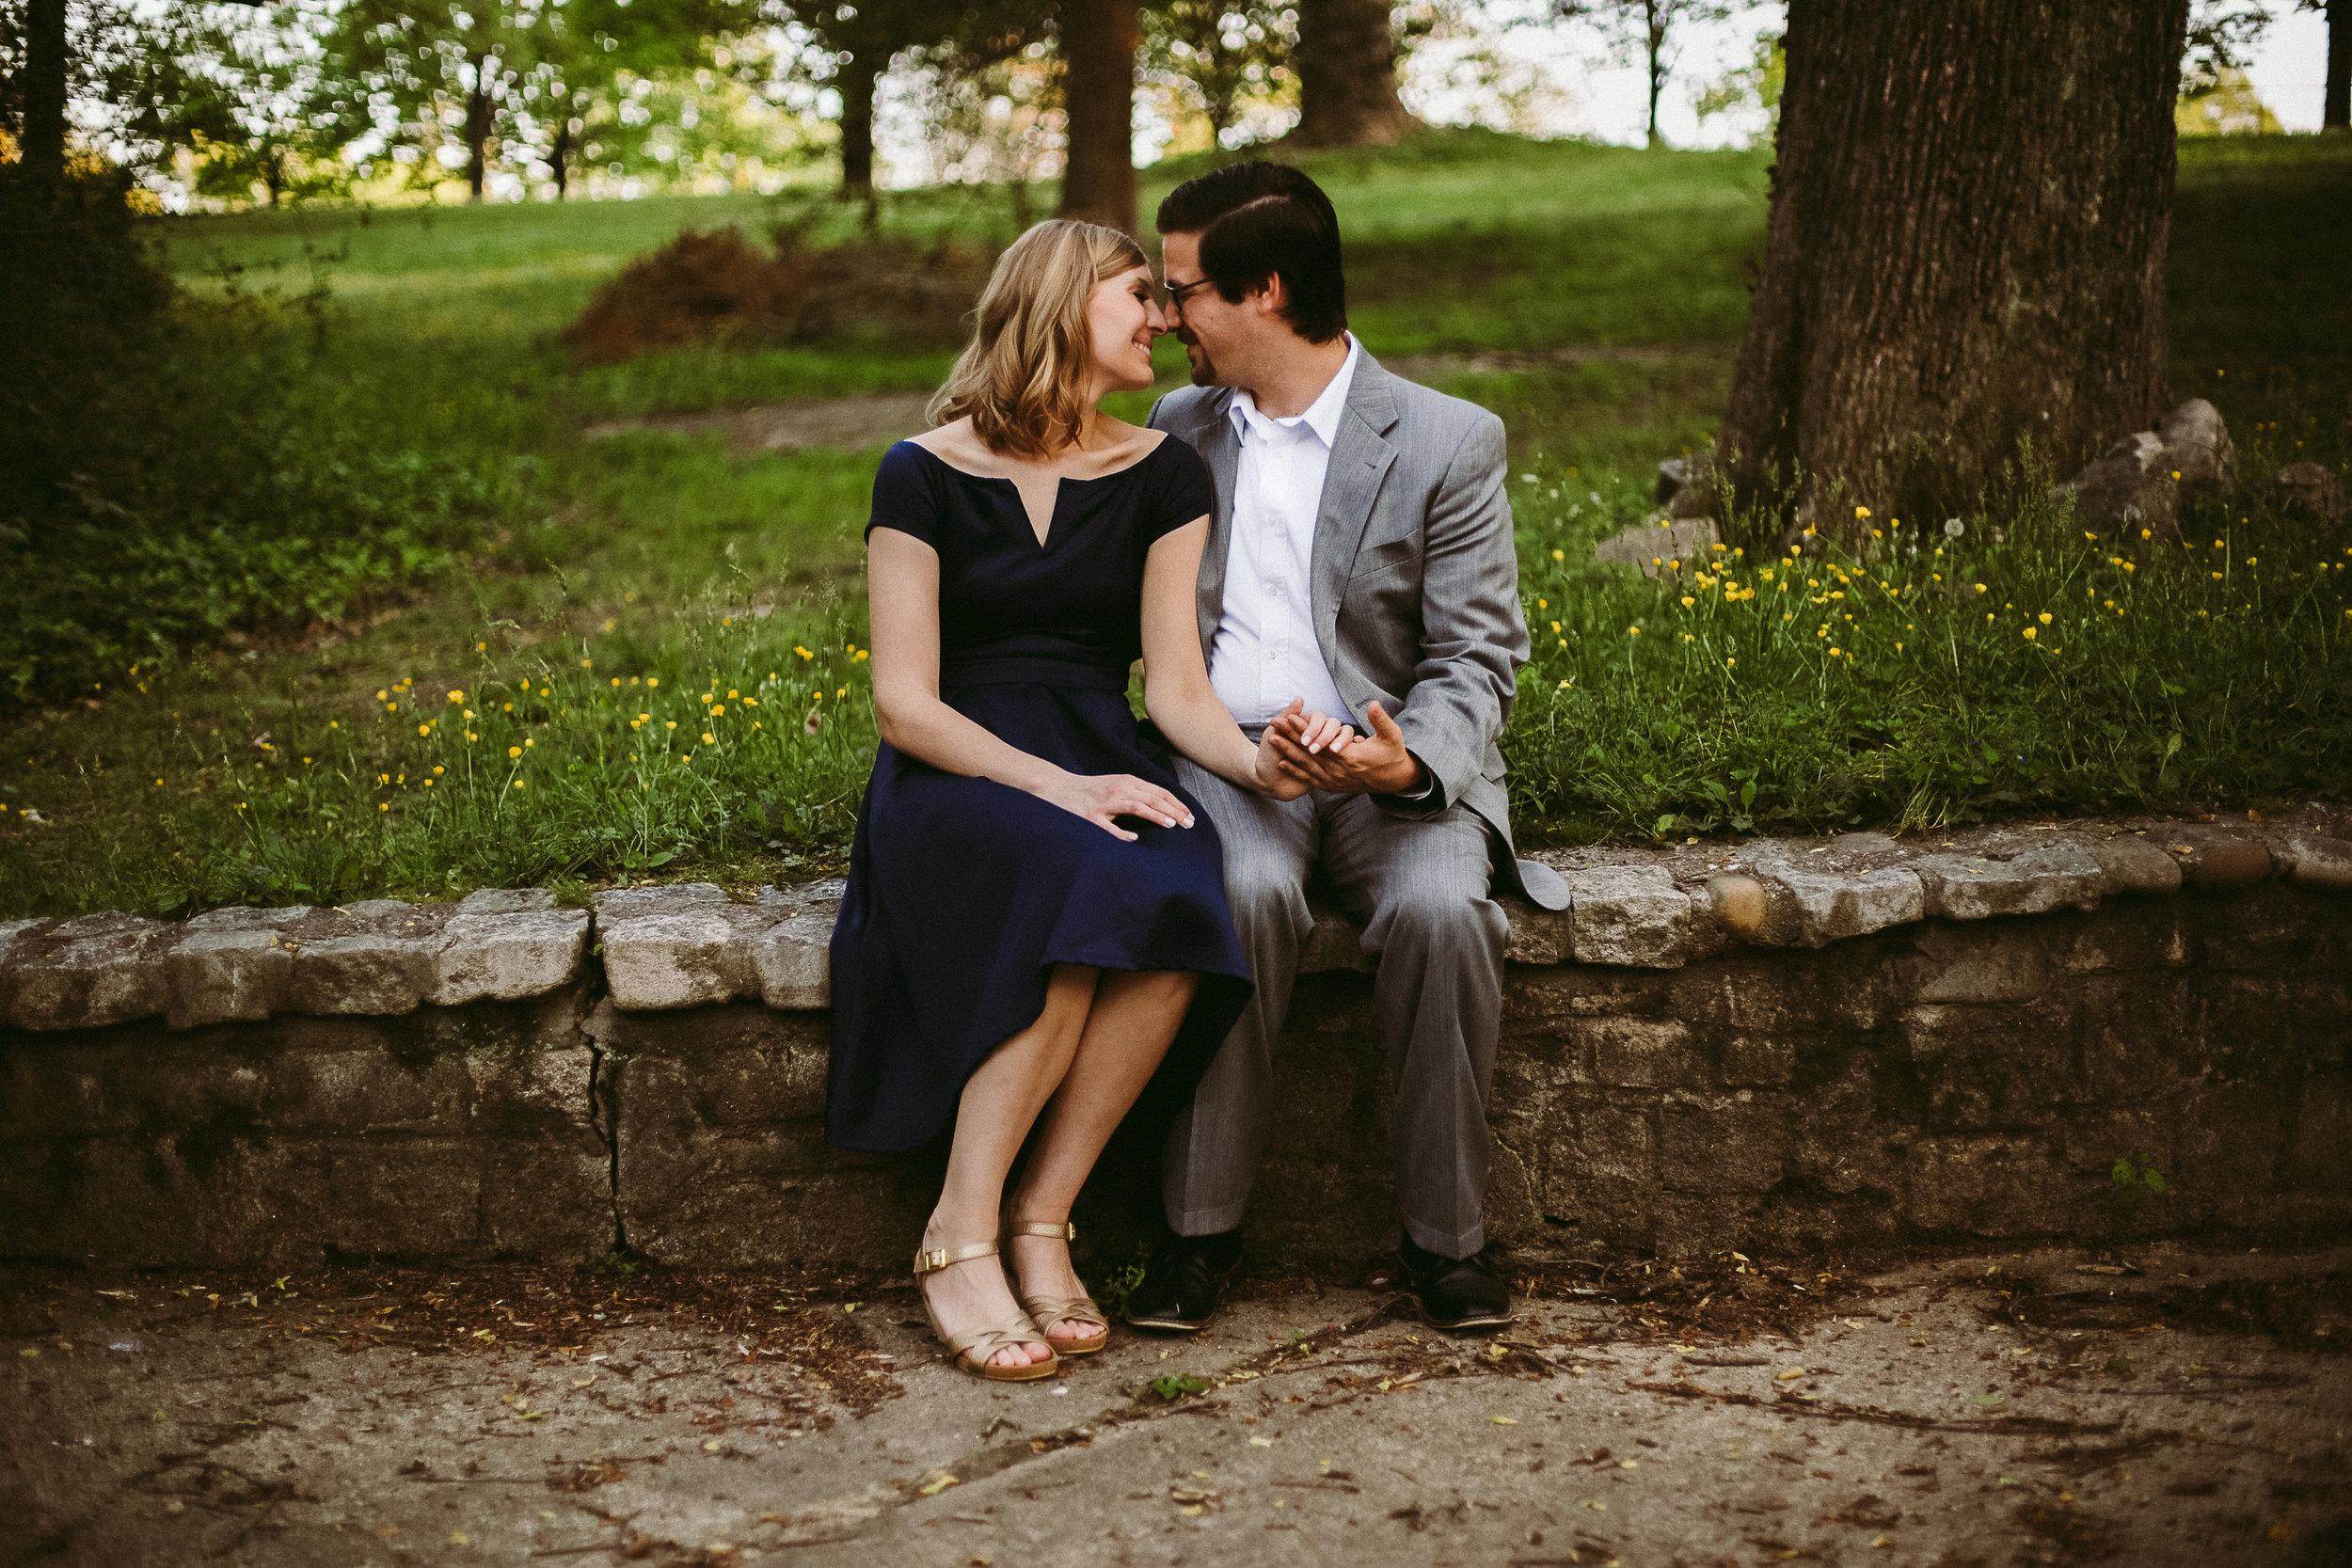 Stephanieandtommyjoe.richmondvirginia.foresthillpark.engagementsession.rebeccaburtphotography-59.jpg